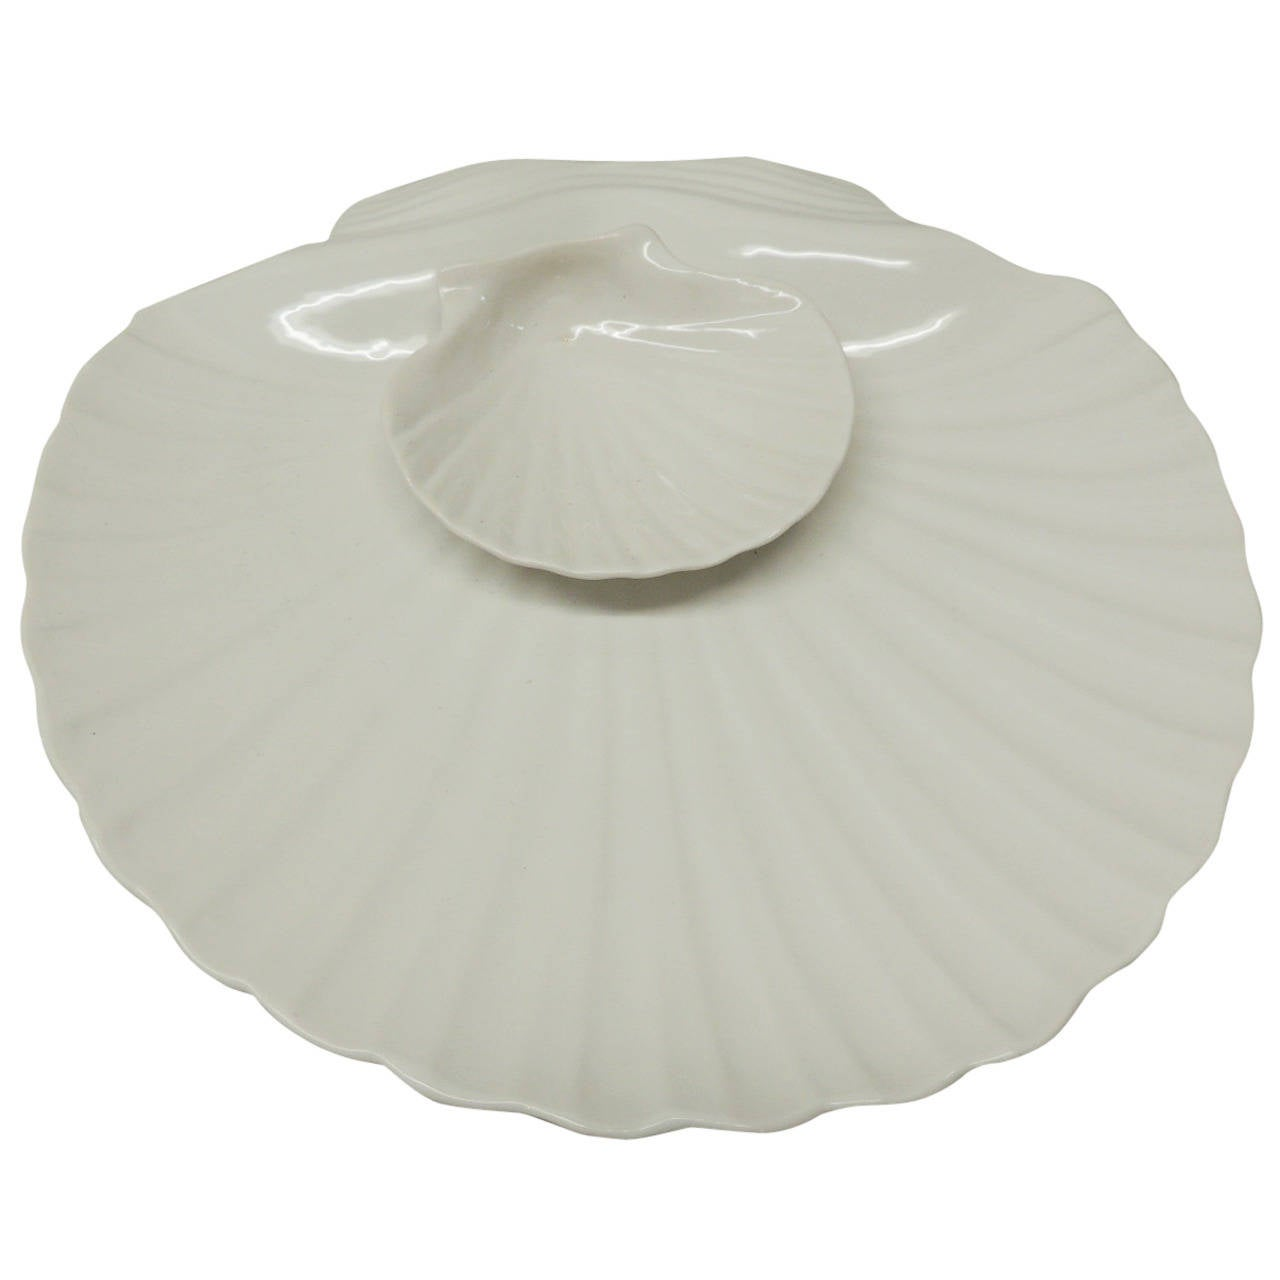 Clam Sea Shell Serving Dish At 1stdibs